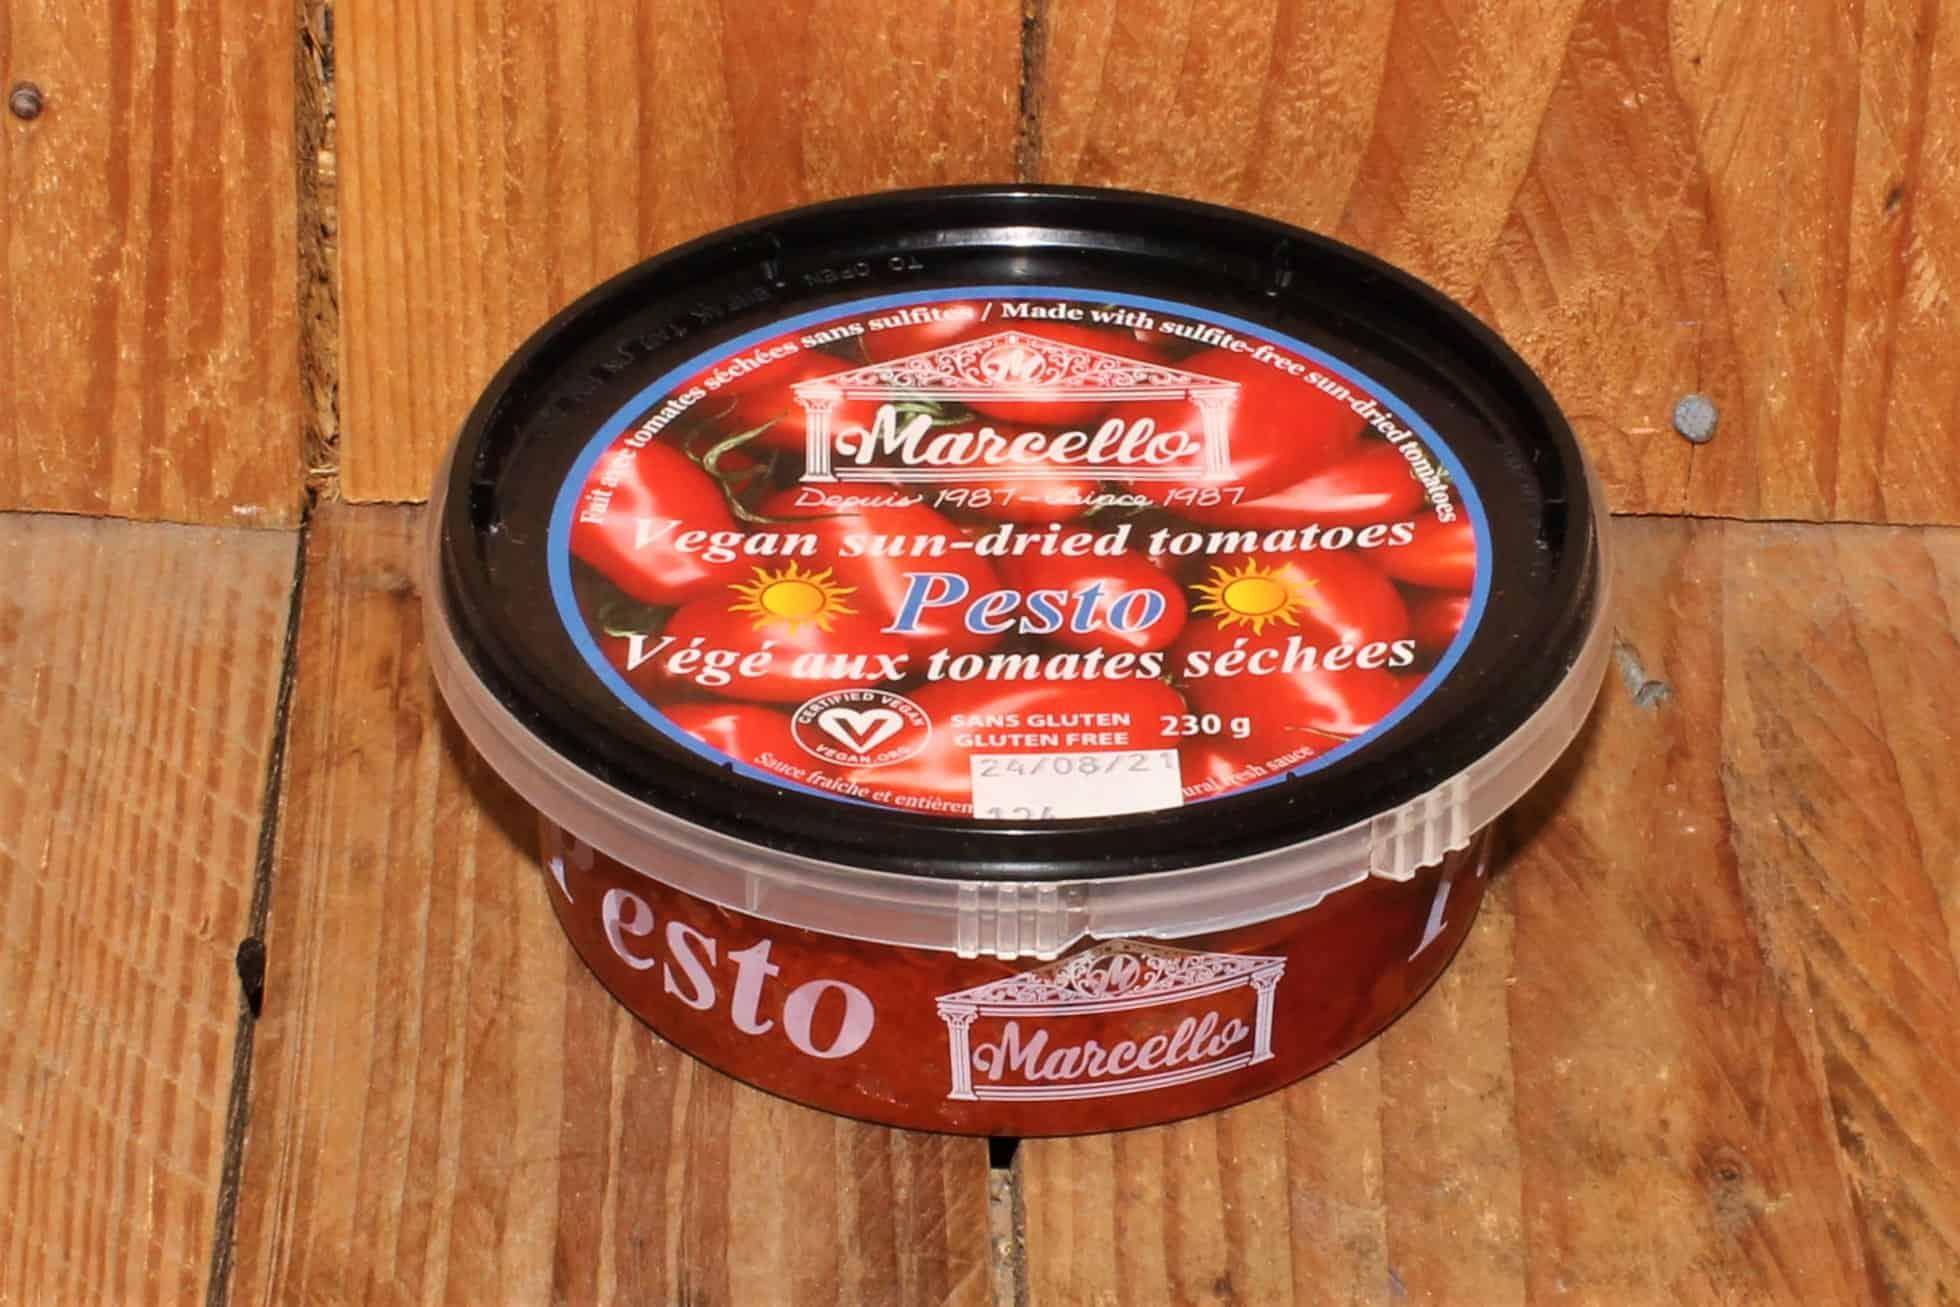 Les Fermes Marcello –  Vegan Pesto, with Sun-Dried Tomatoes (230g)